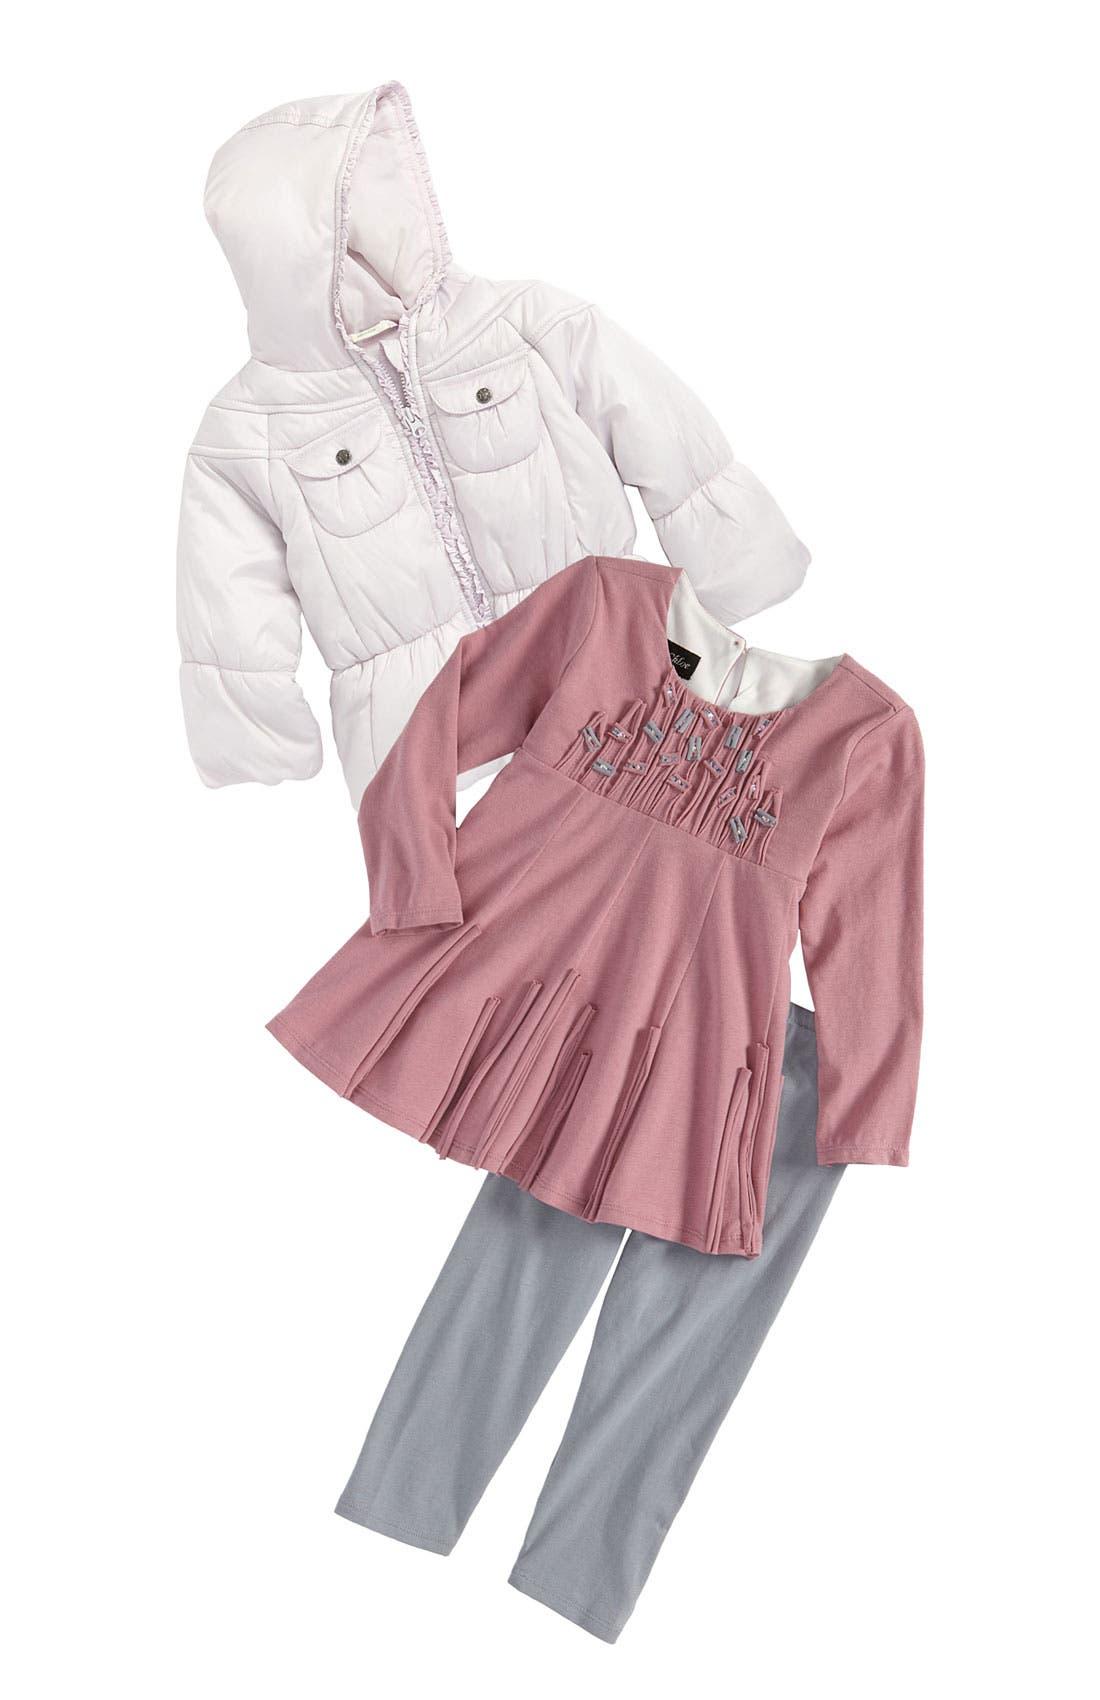 Main Image - Isobella & Chloe Dress & Leggings (Infant)